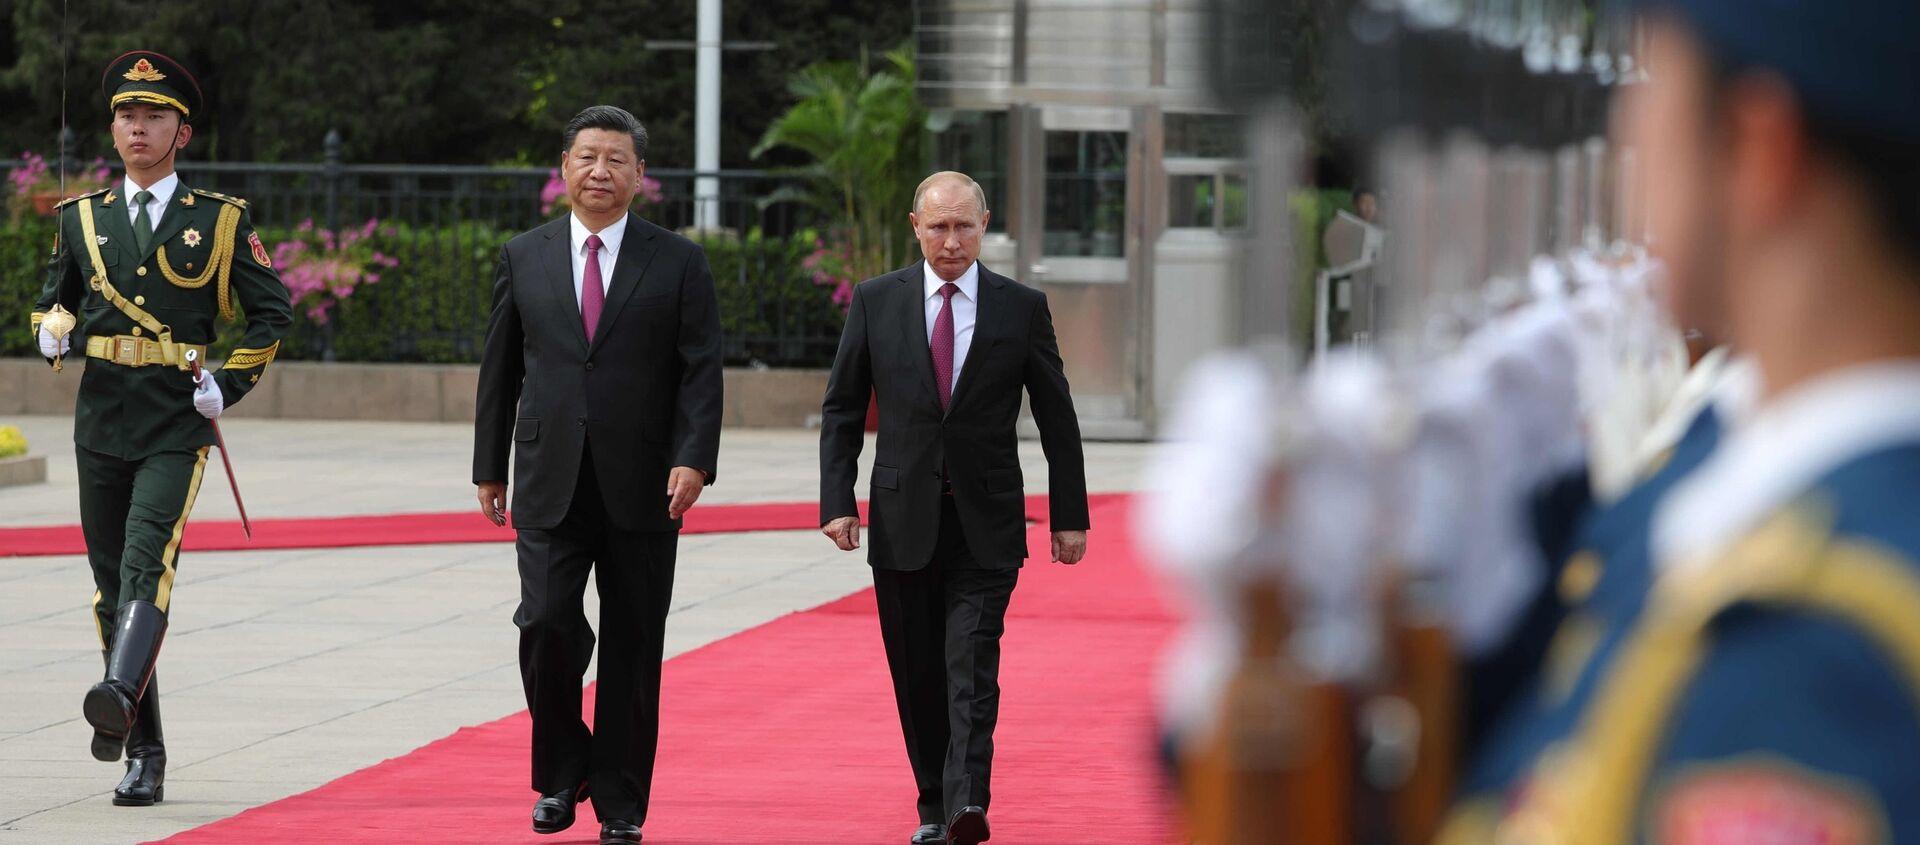 Presidente de China, Xi Jinping, y presidente de Rusia, Vladímir Putin - Sputnik Mundo, 1920, 27.10.2020